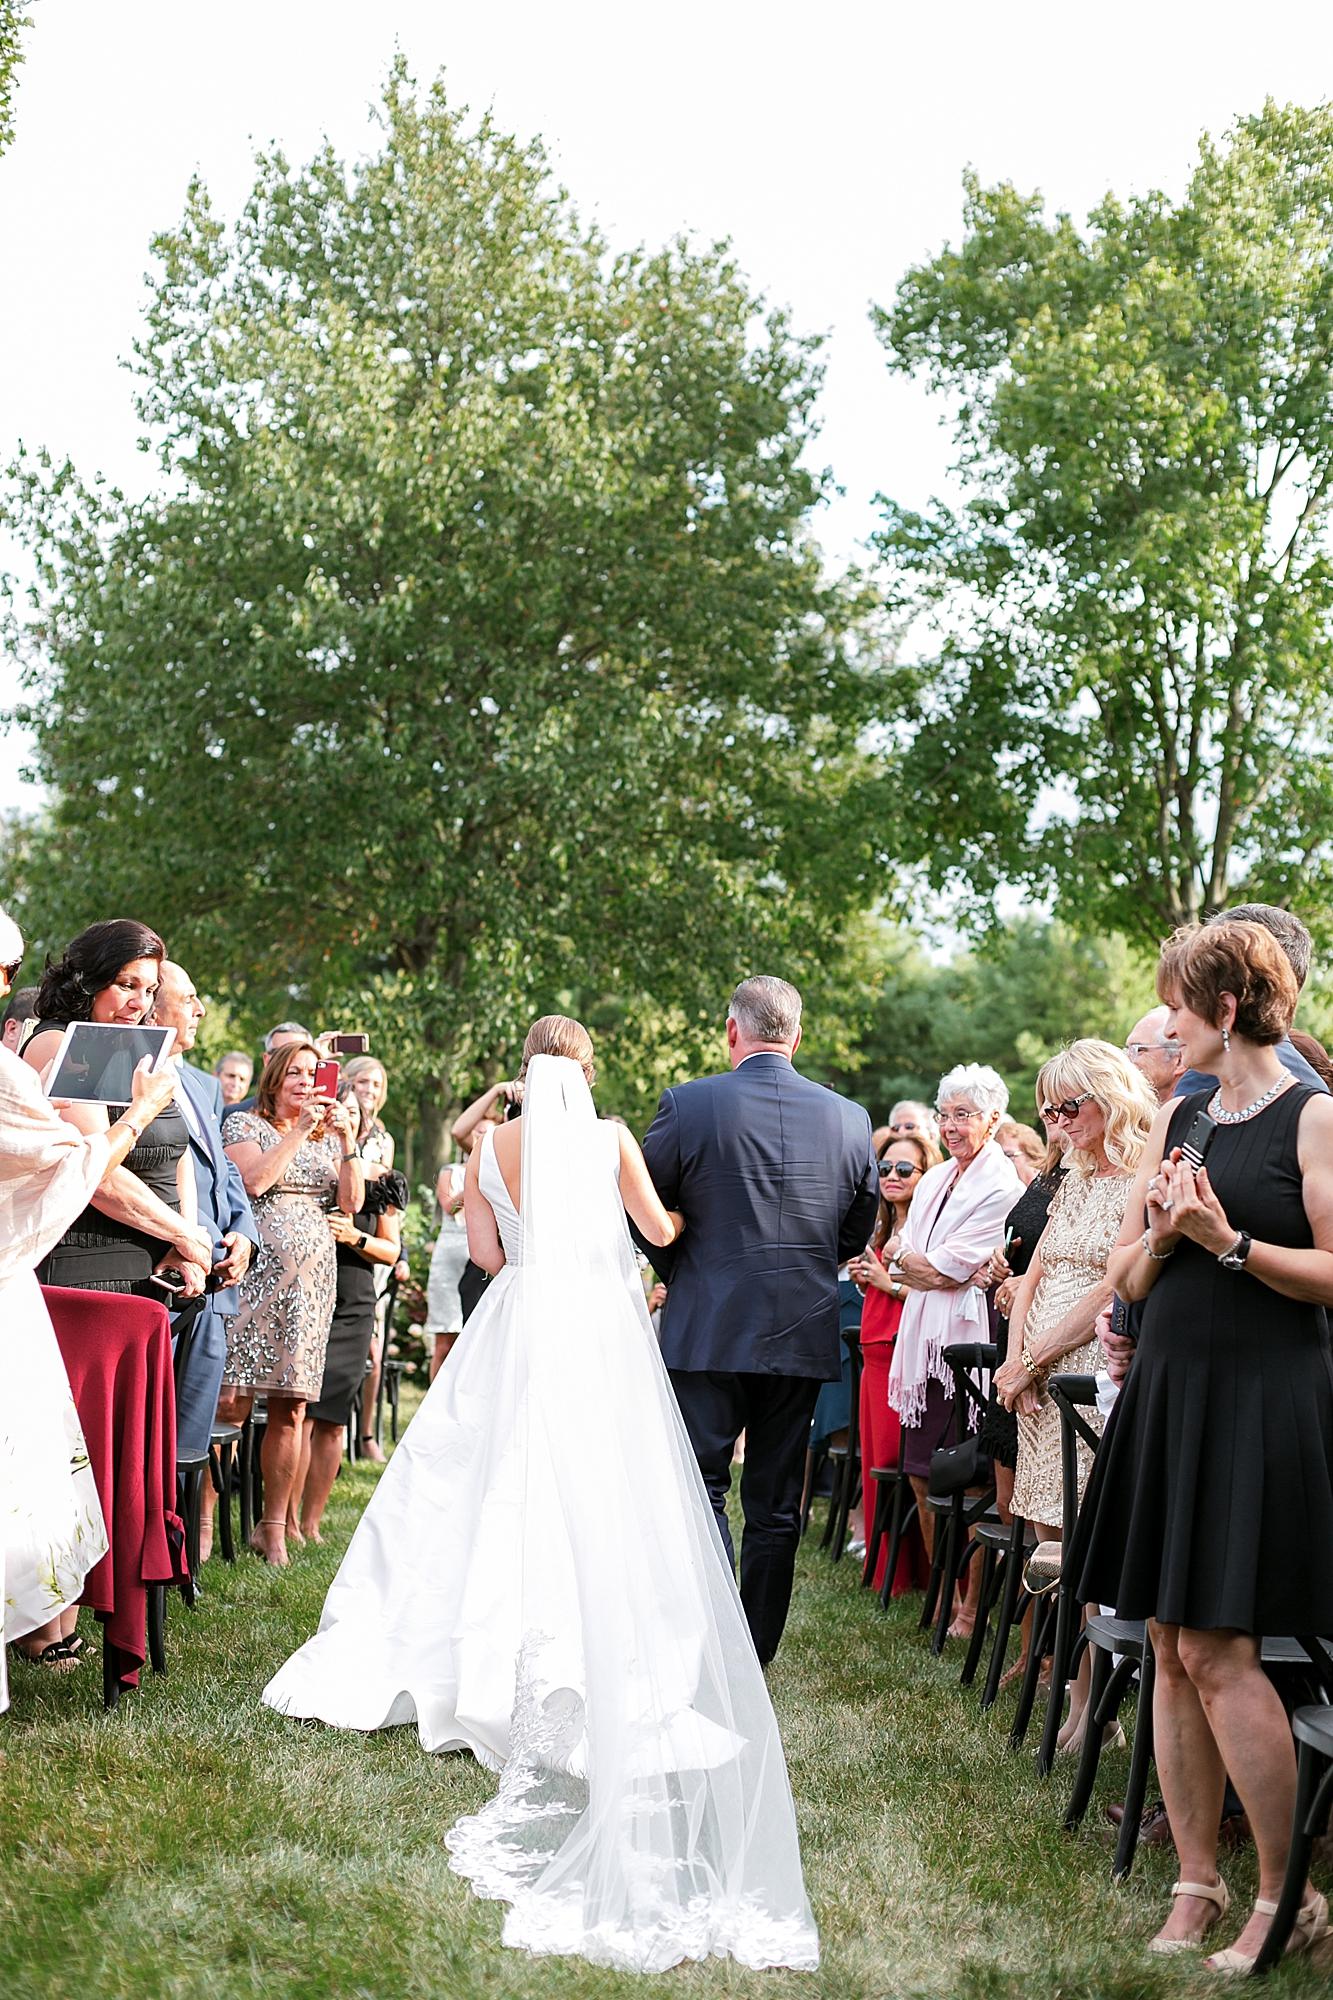 Princeton New Jersey Film Wedding Photographer Princeton University Wedding Photography by Magdalena Studios NJ Wedding Photographer33